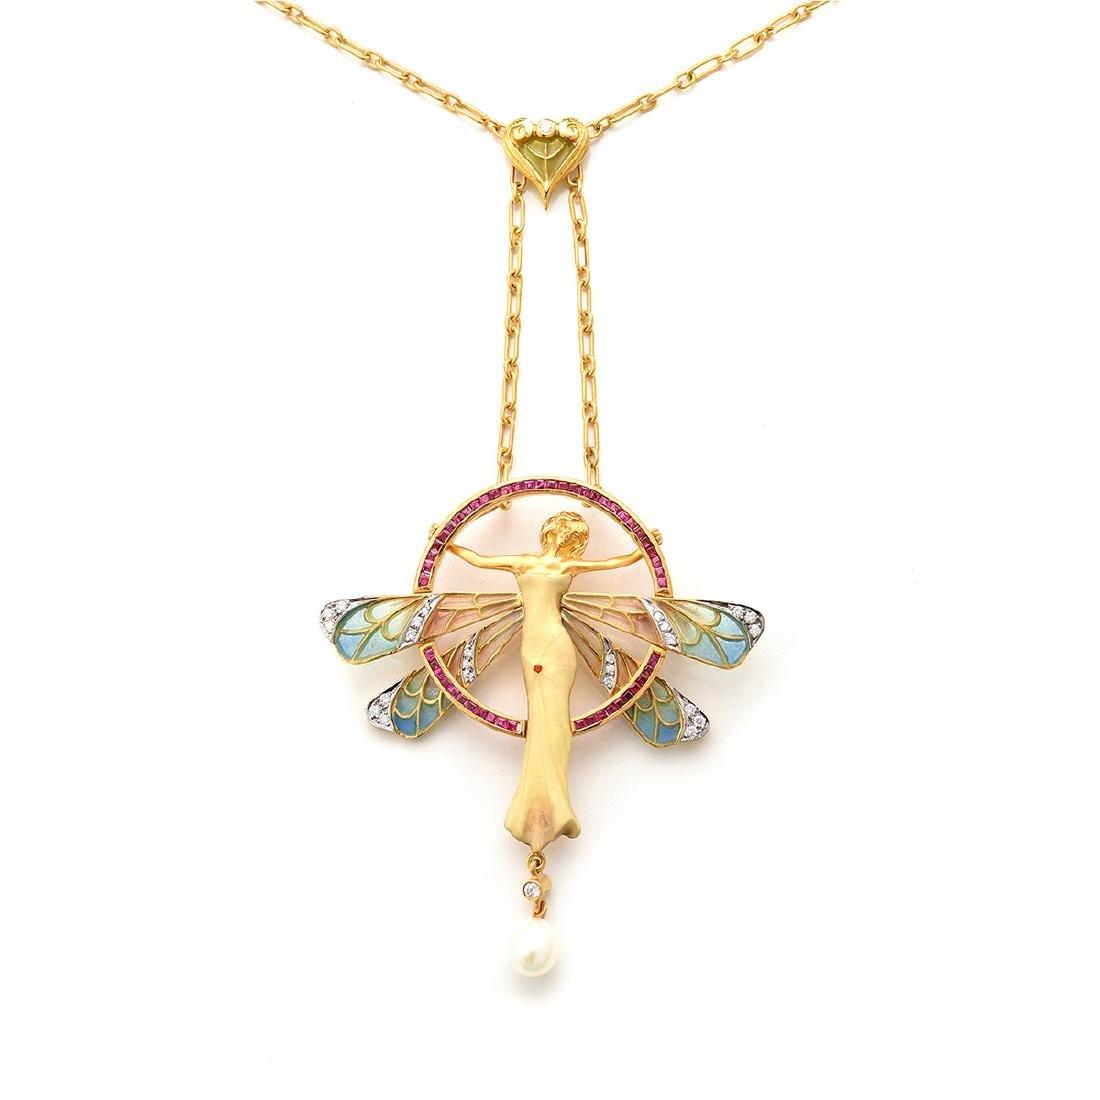 Masriera Enamel, Diamond, Ruby, 18k Yellow Gold Brooch